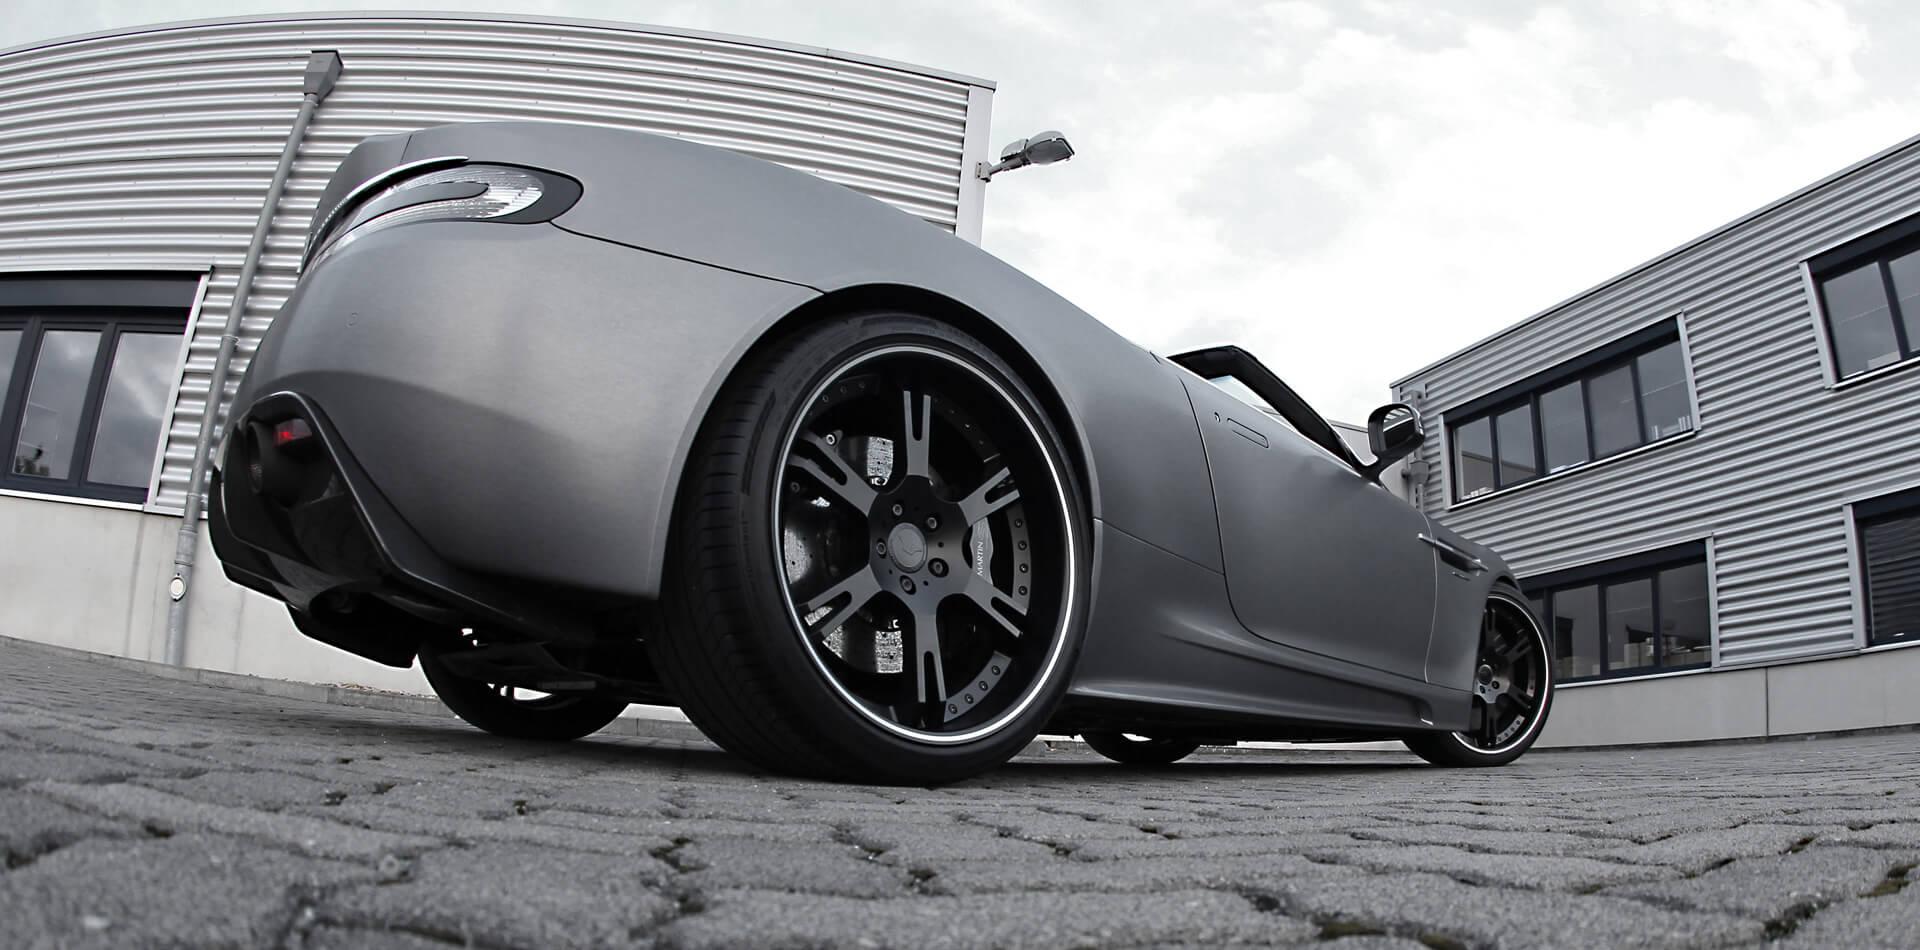 DBS_Aston_Martin-705x349 (1)